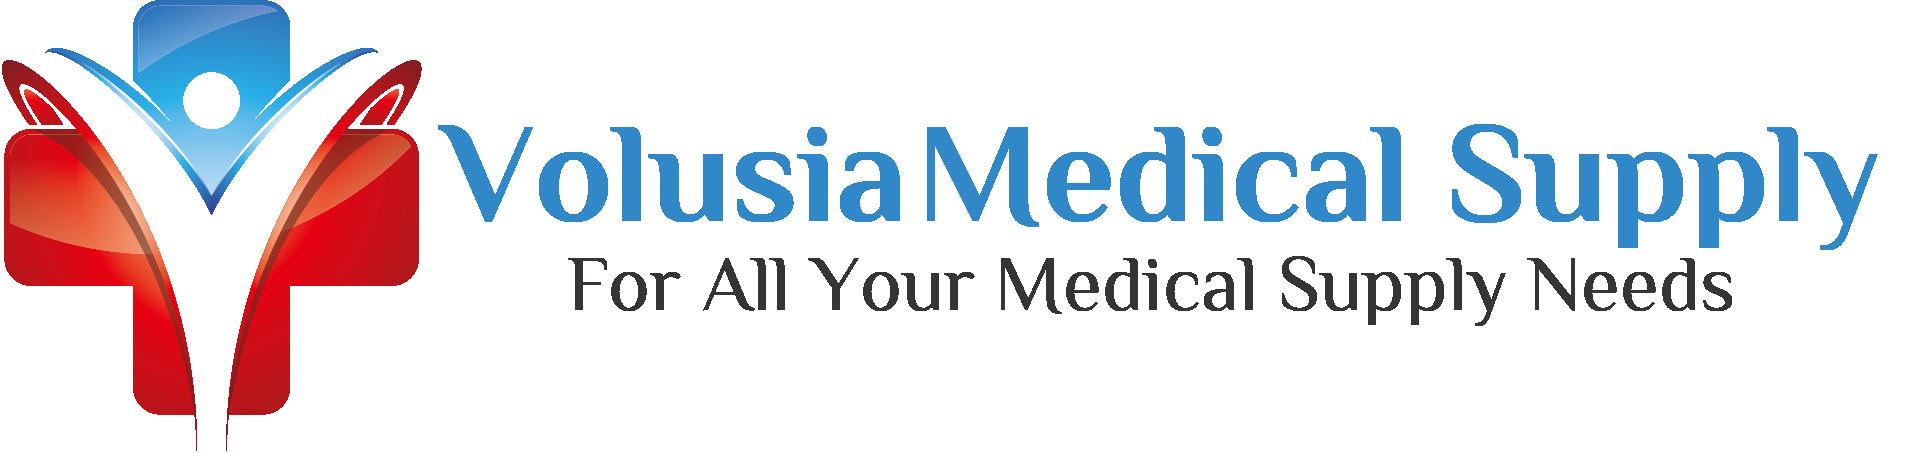 Volusia Medical Supplies